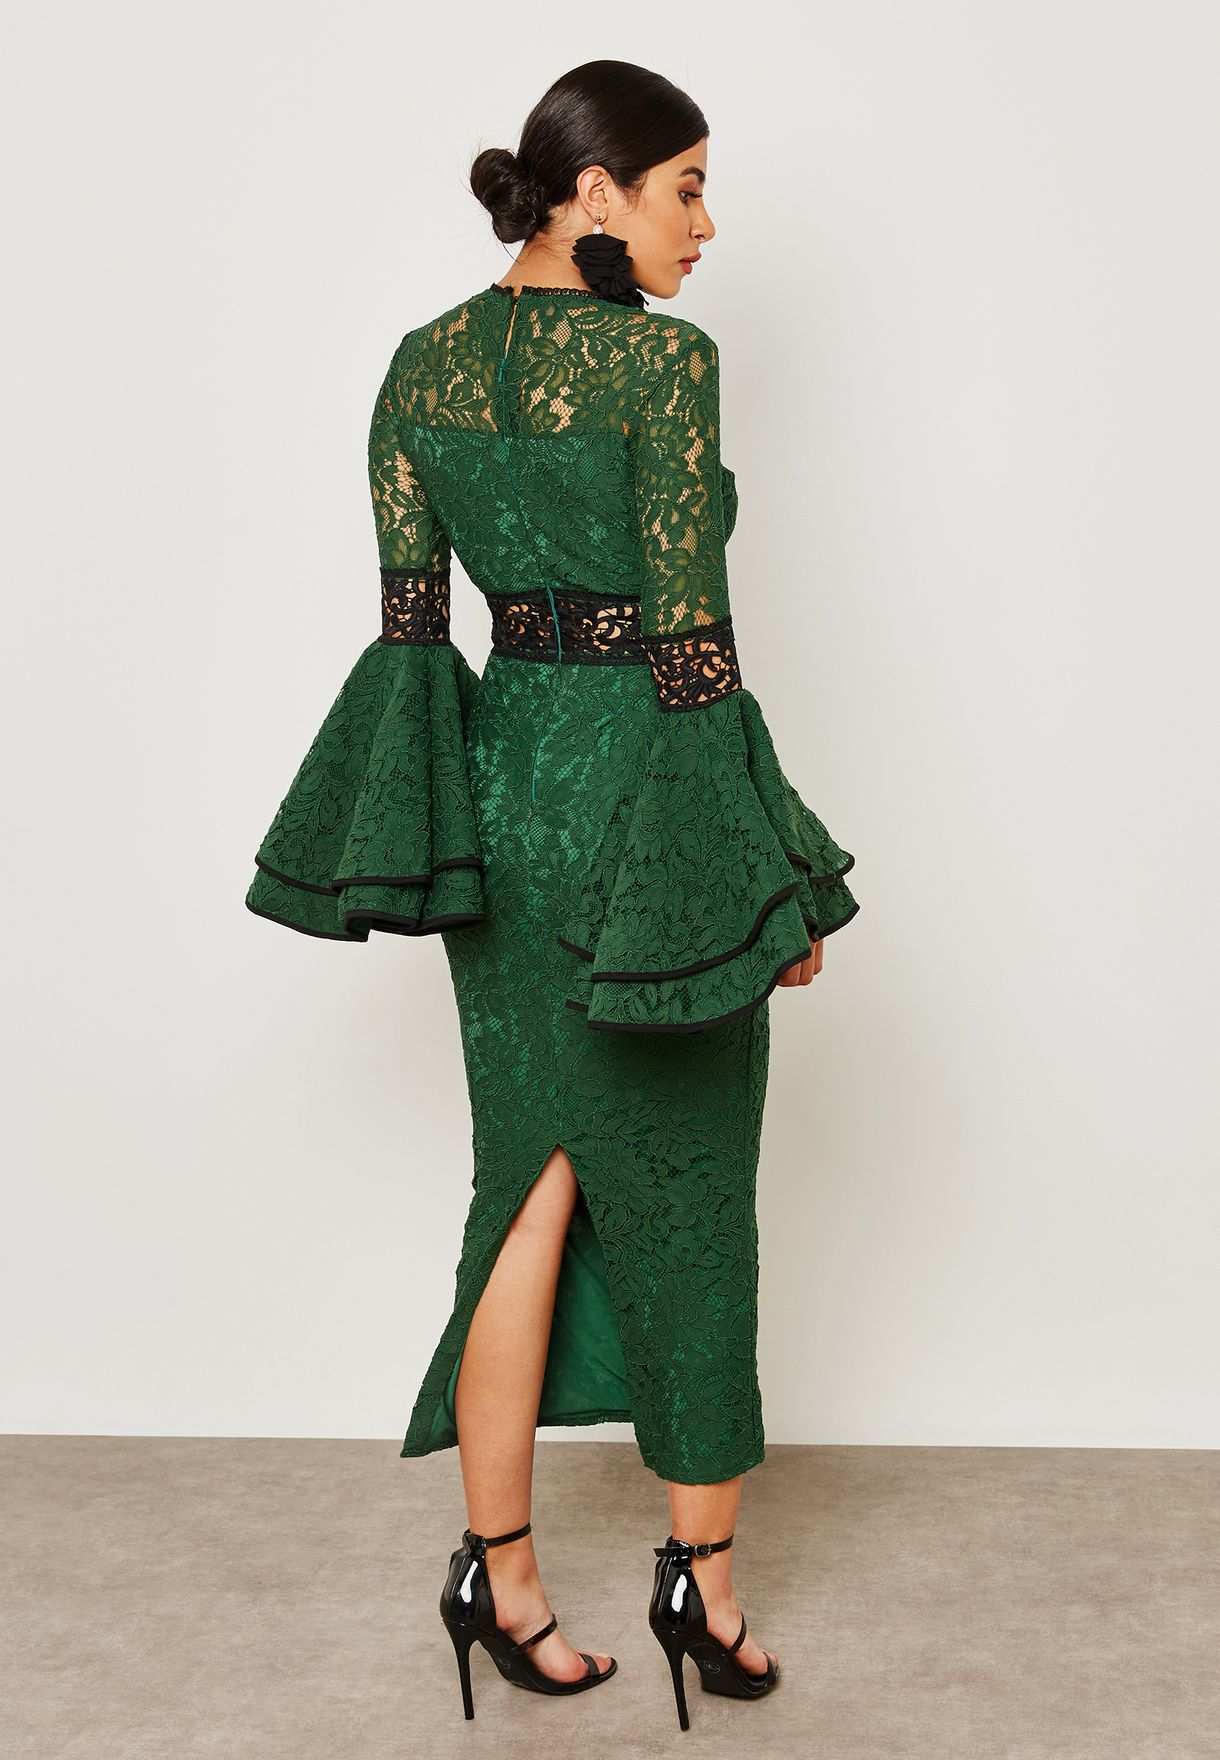 فستان بأكمام دانتيل كشكش